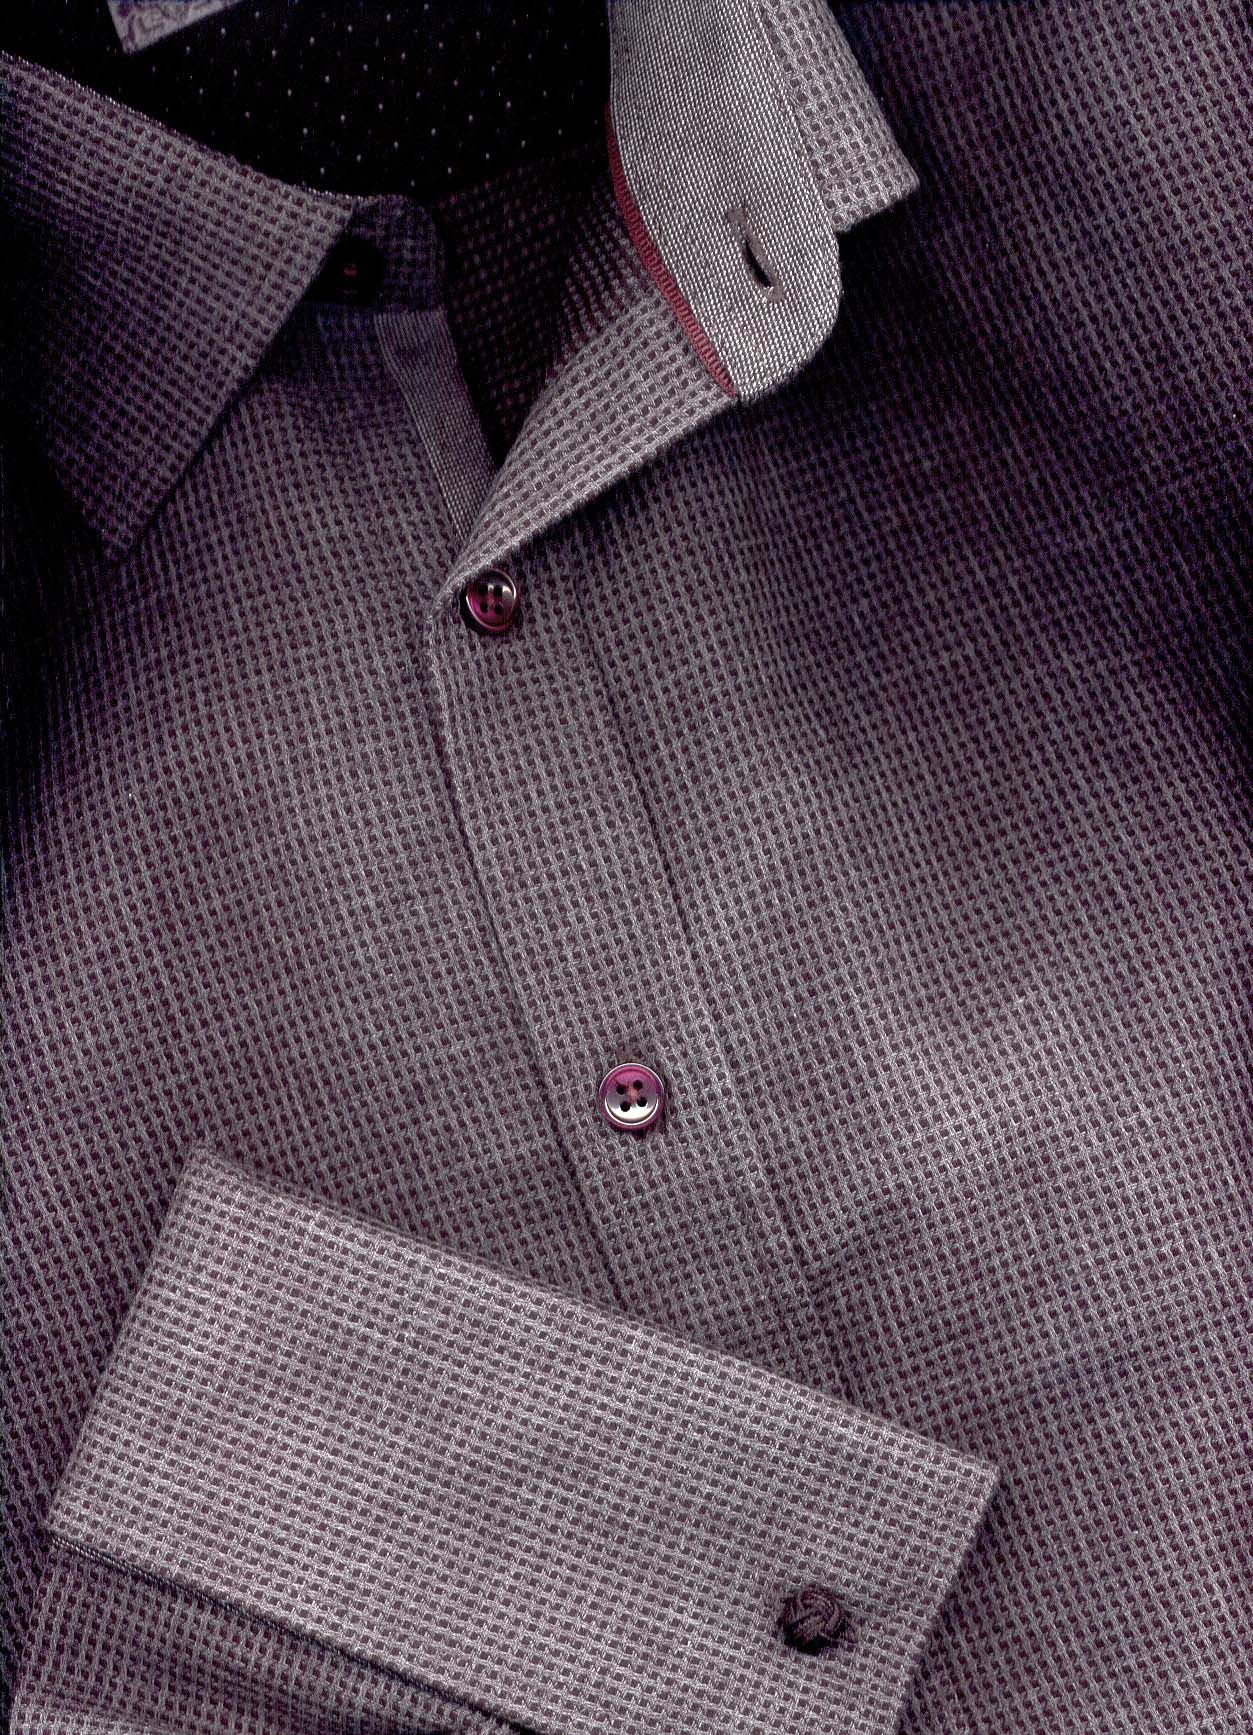 Designer Men's French Cuff Shirts